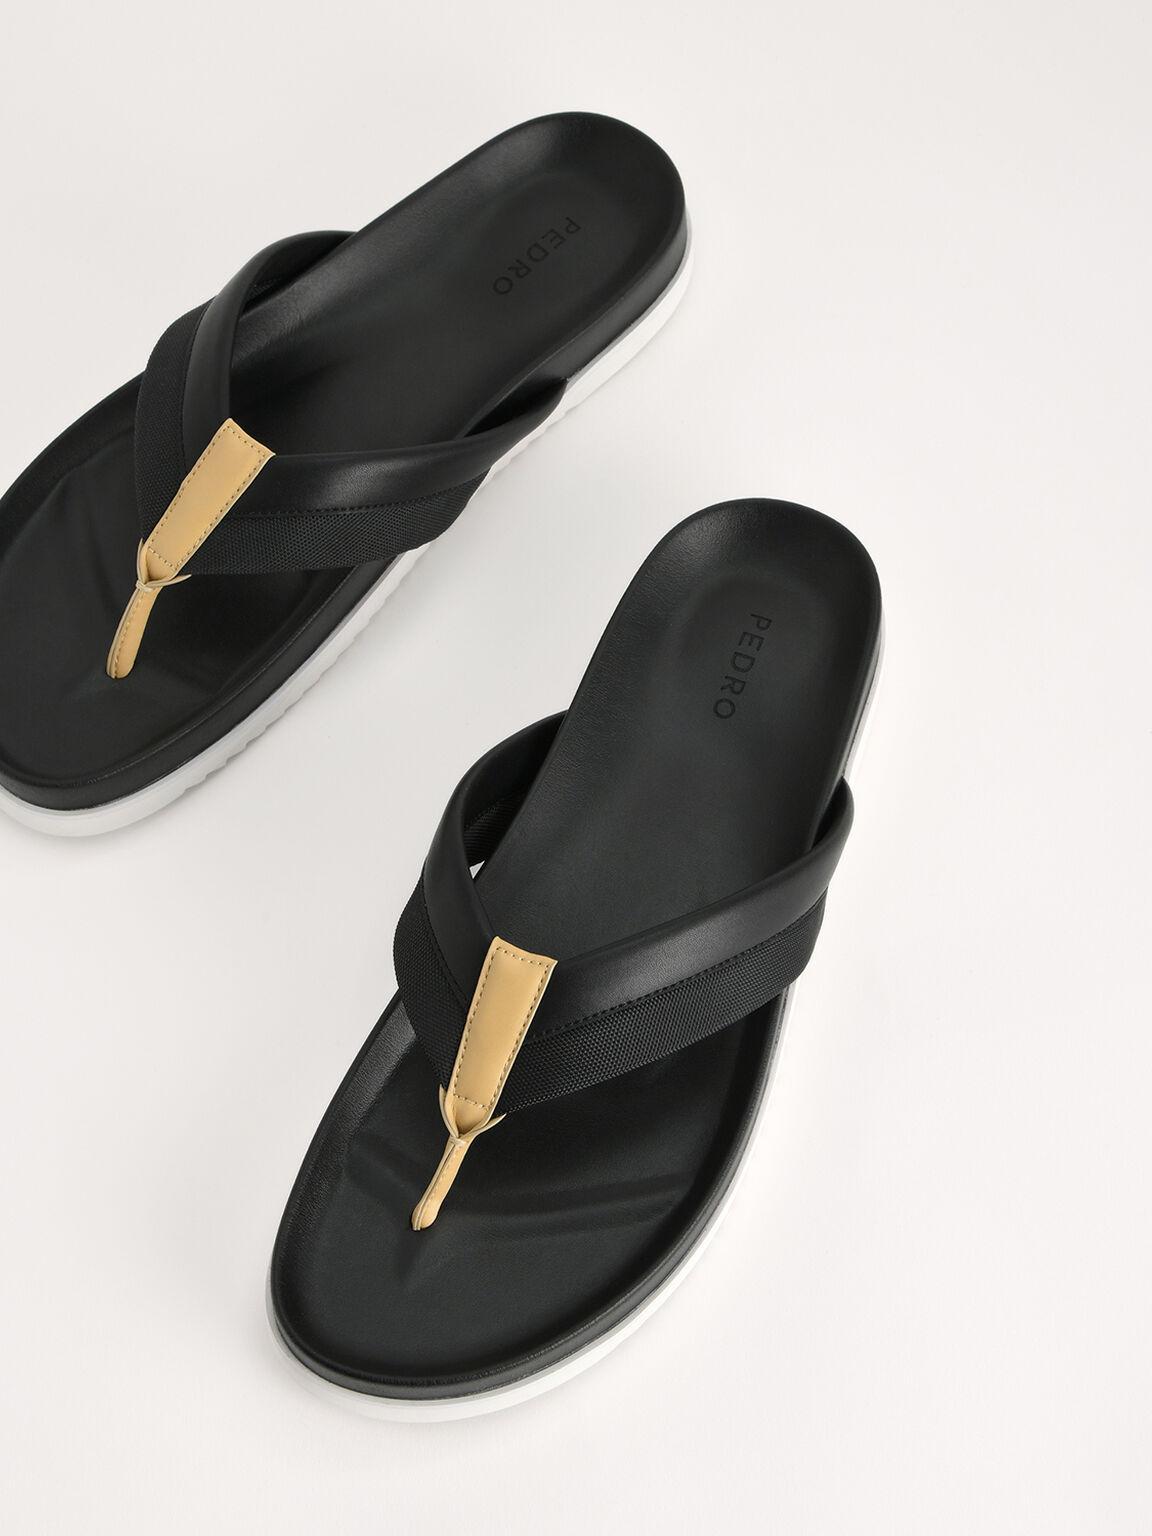 Double Banded Thong Sandals, Black, hi-res